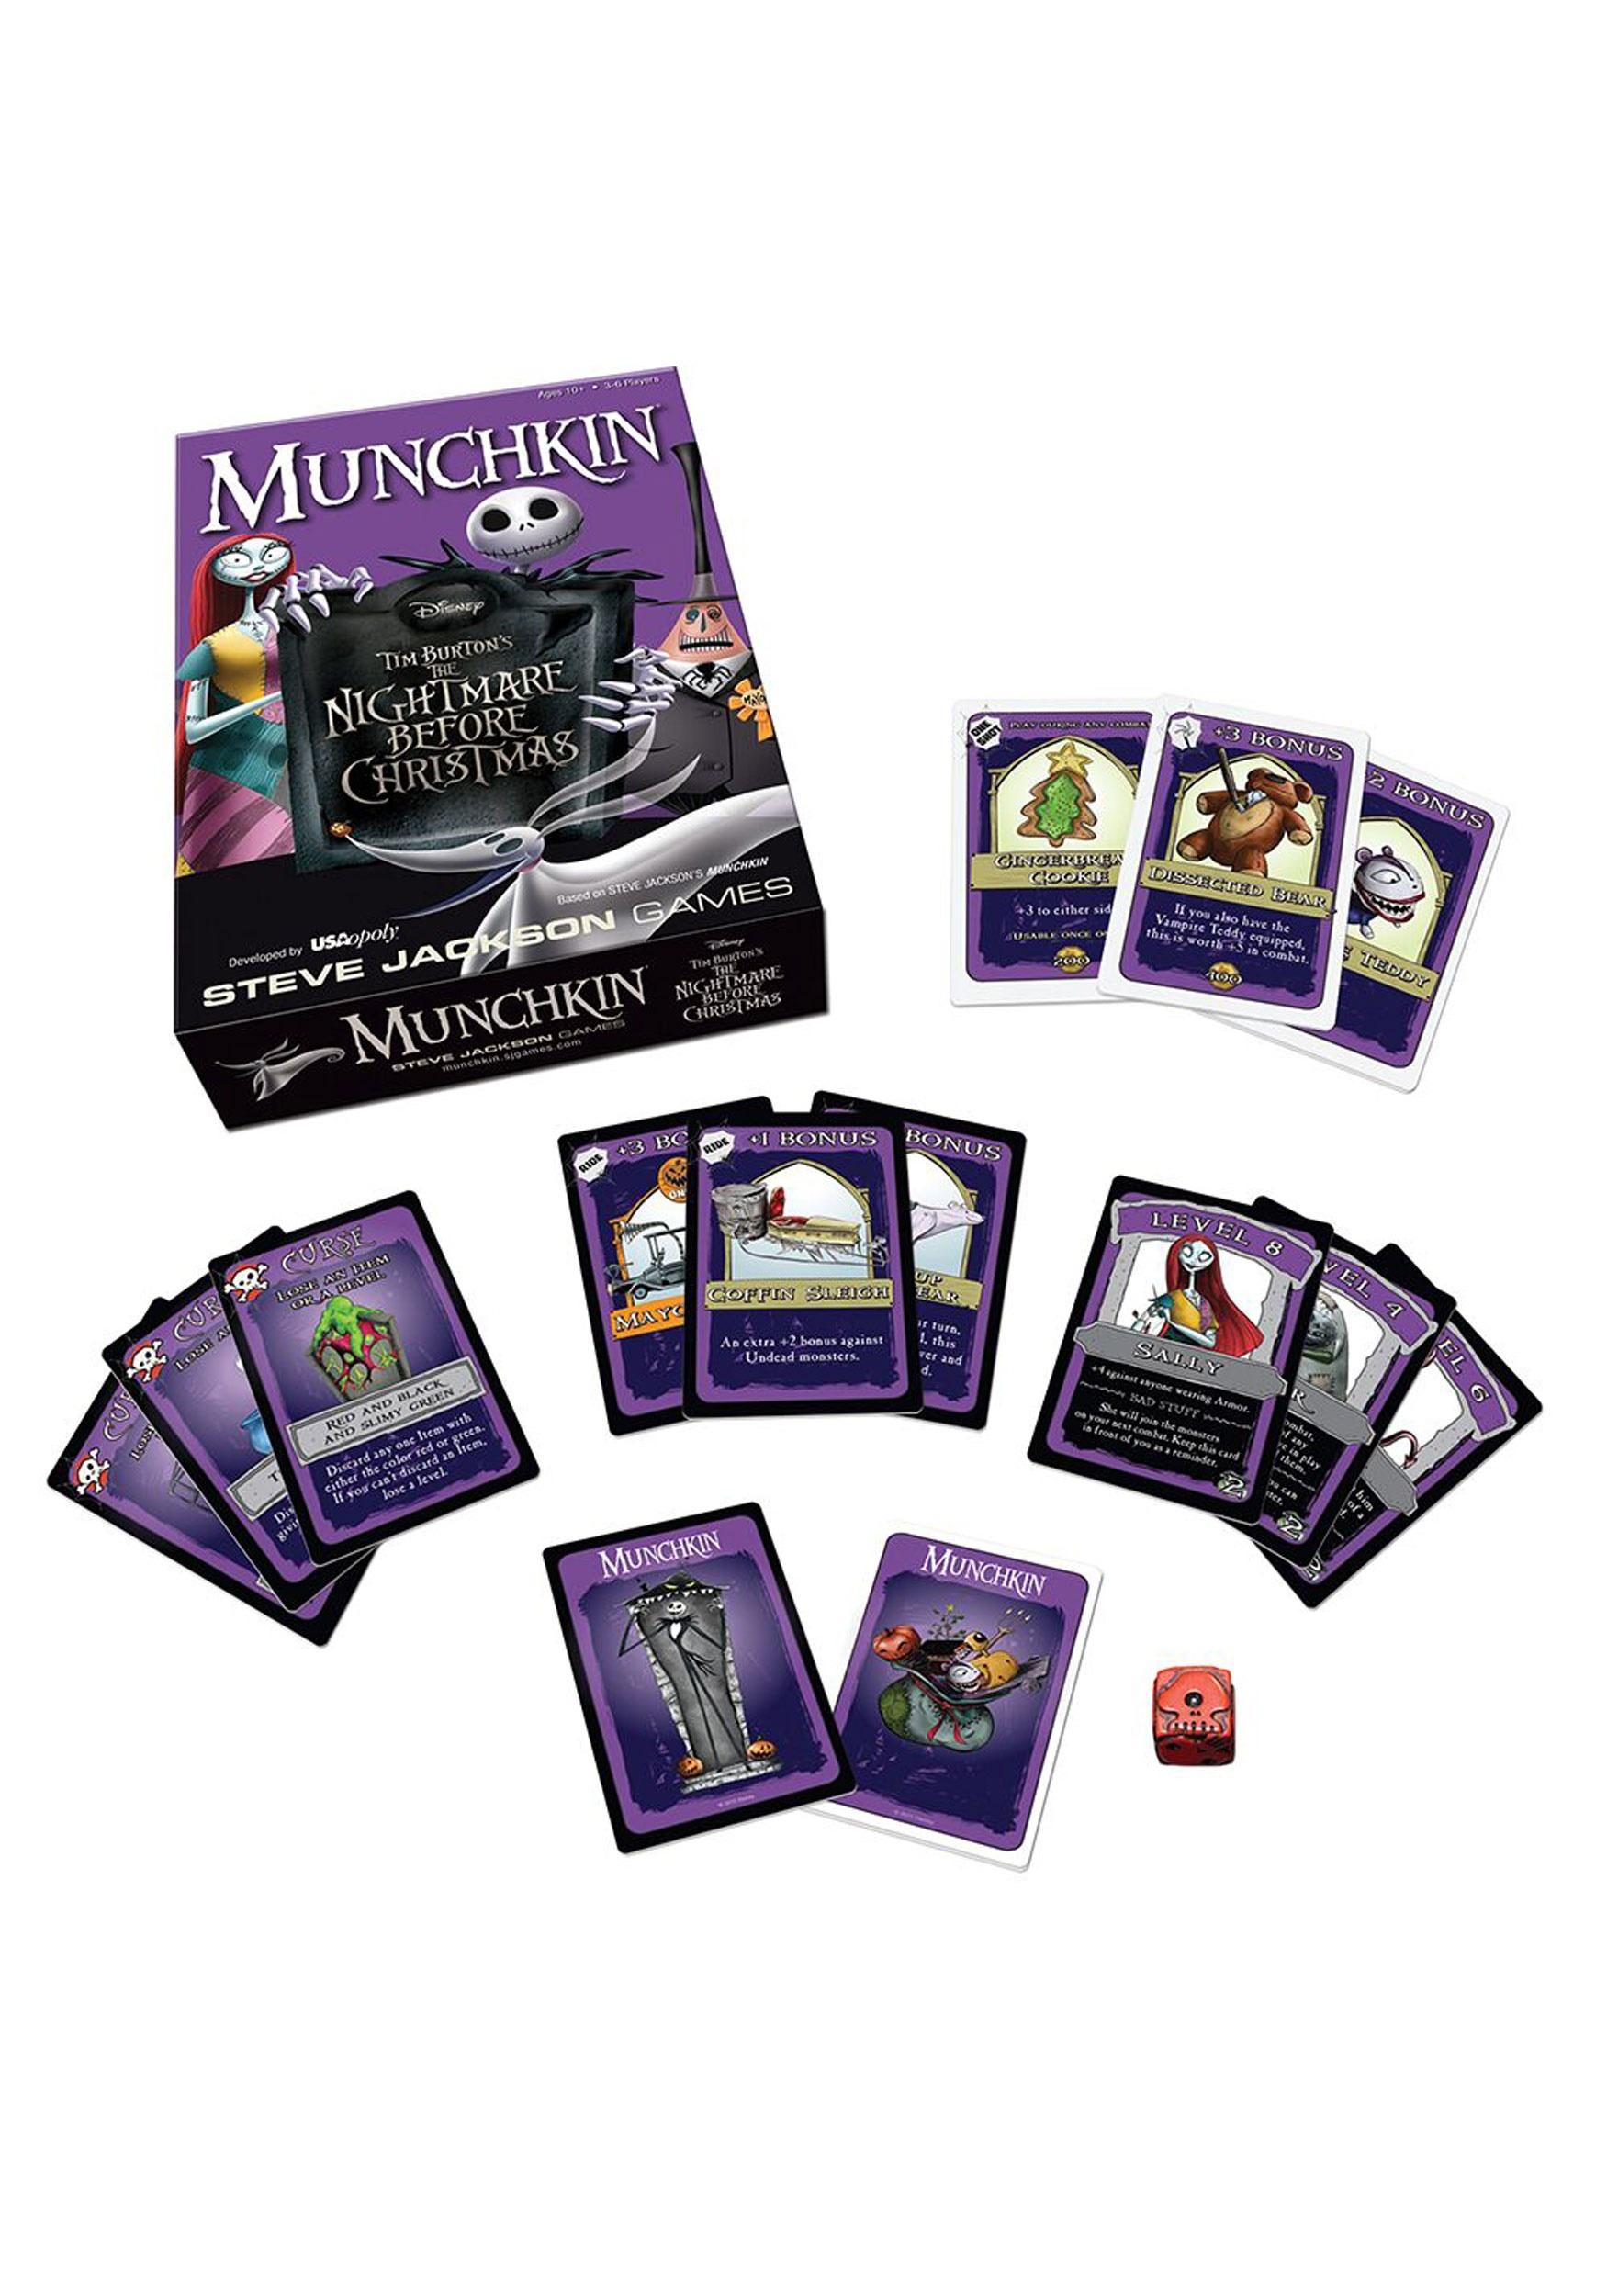 munchkin the nightmare before christmas card game 2 - The Nightmare Before Christmas Games